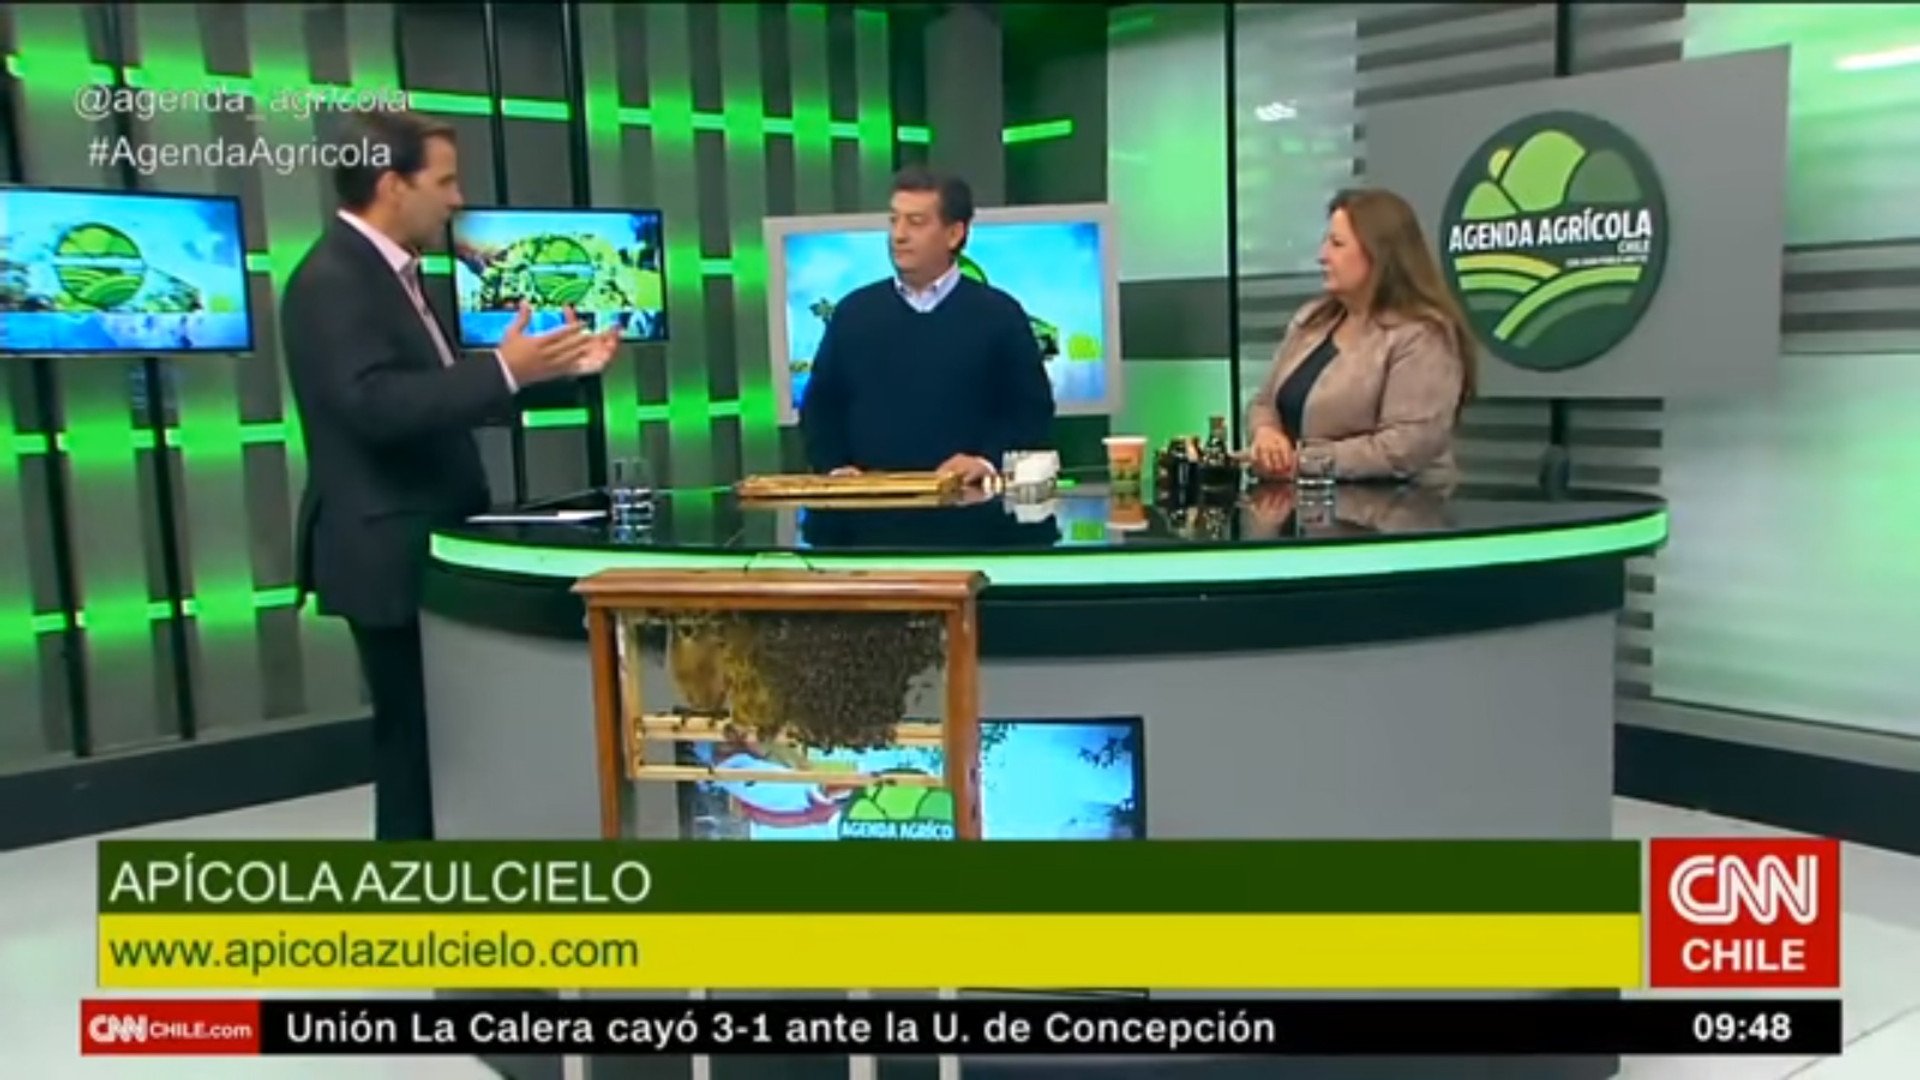 Agenda Agricola CNN